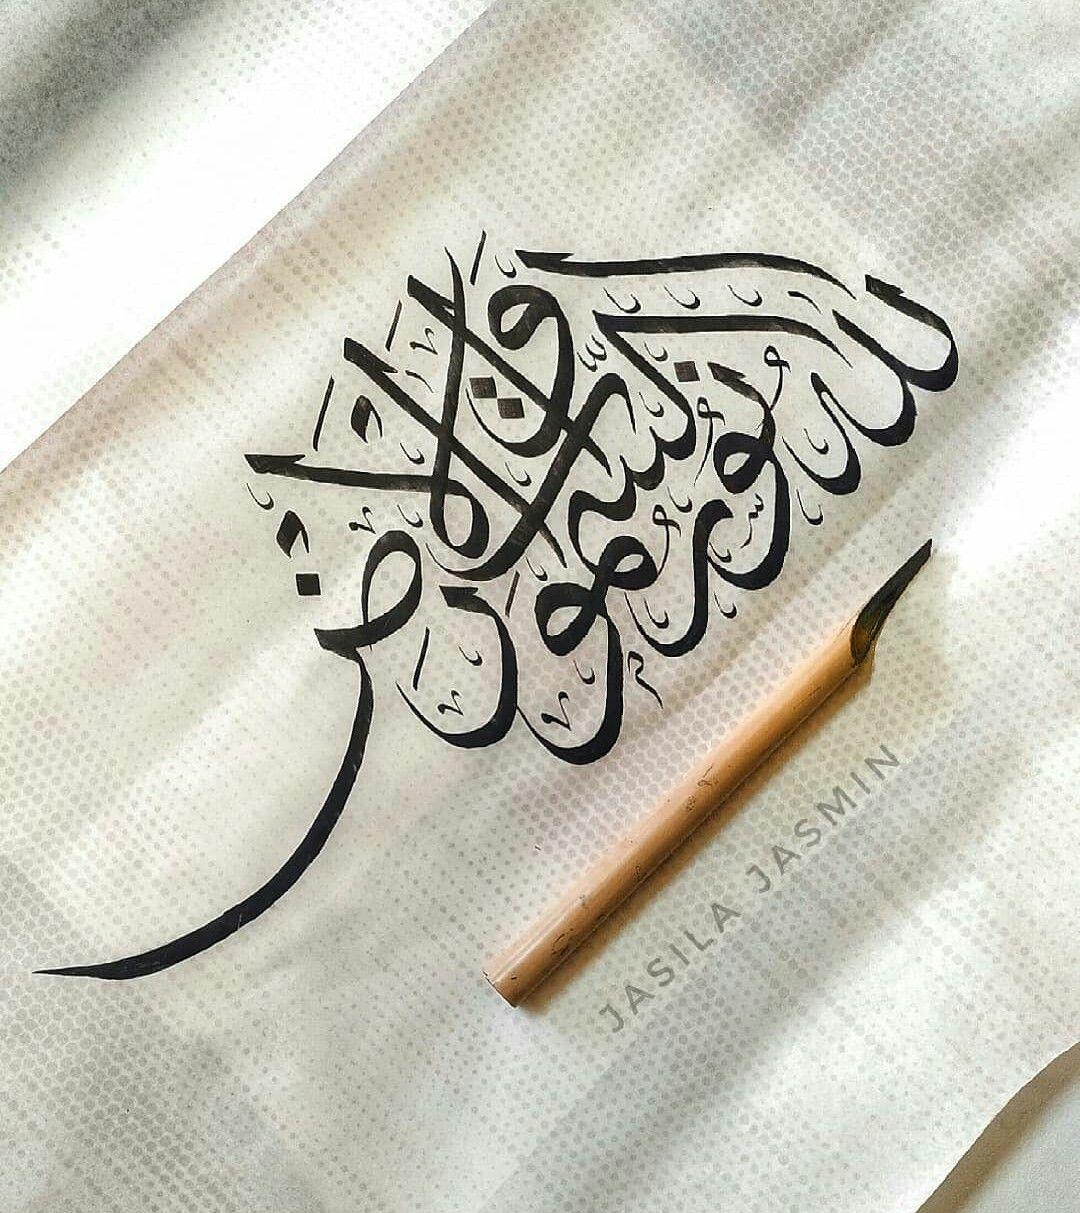 Pin By Mohamed Elpenny On آيات قرآنية Islamic Caligraphy Art Arabic Calligraphy Painting Islamic Art Calligraphy